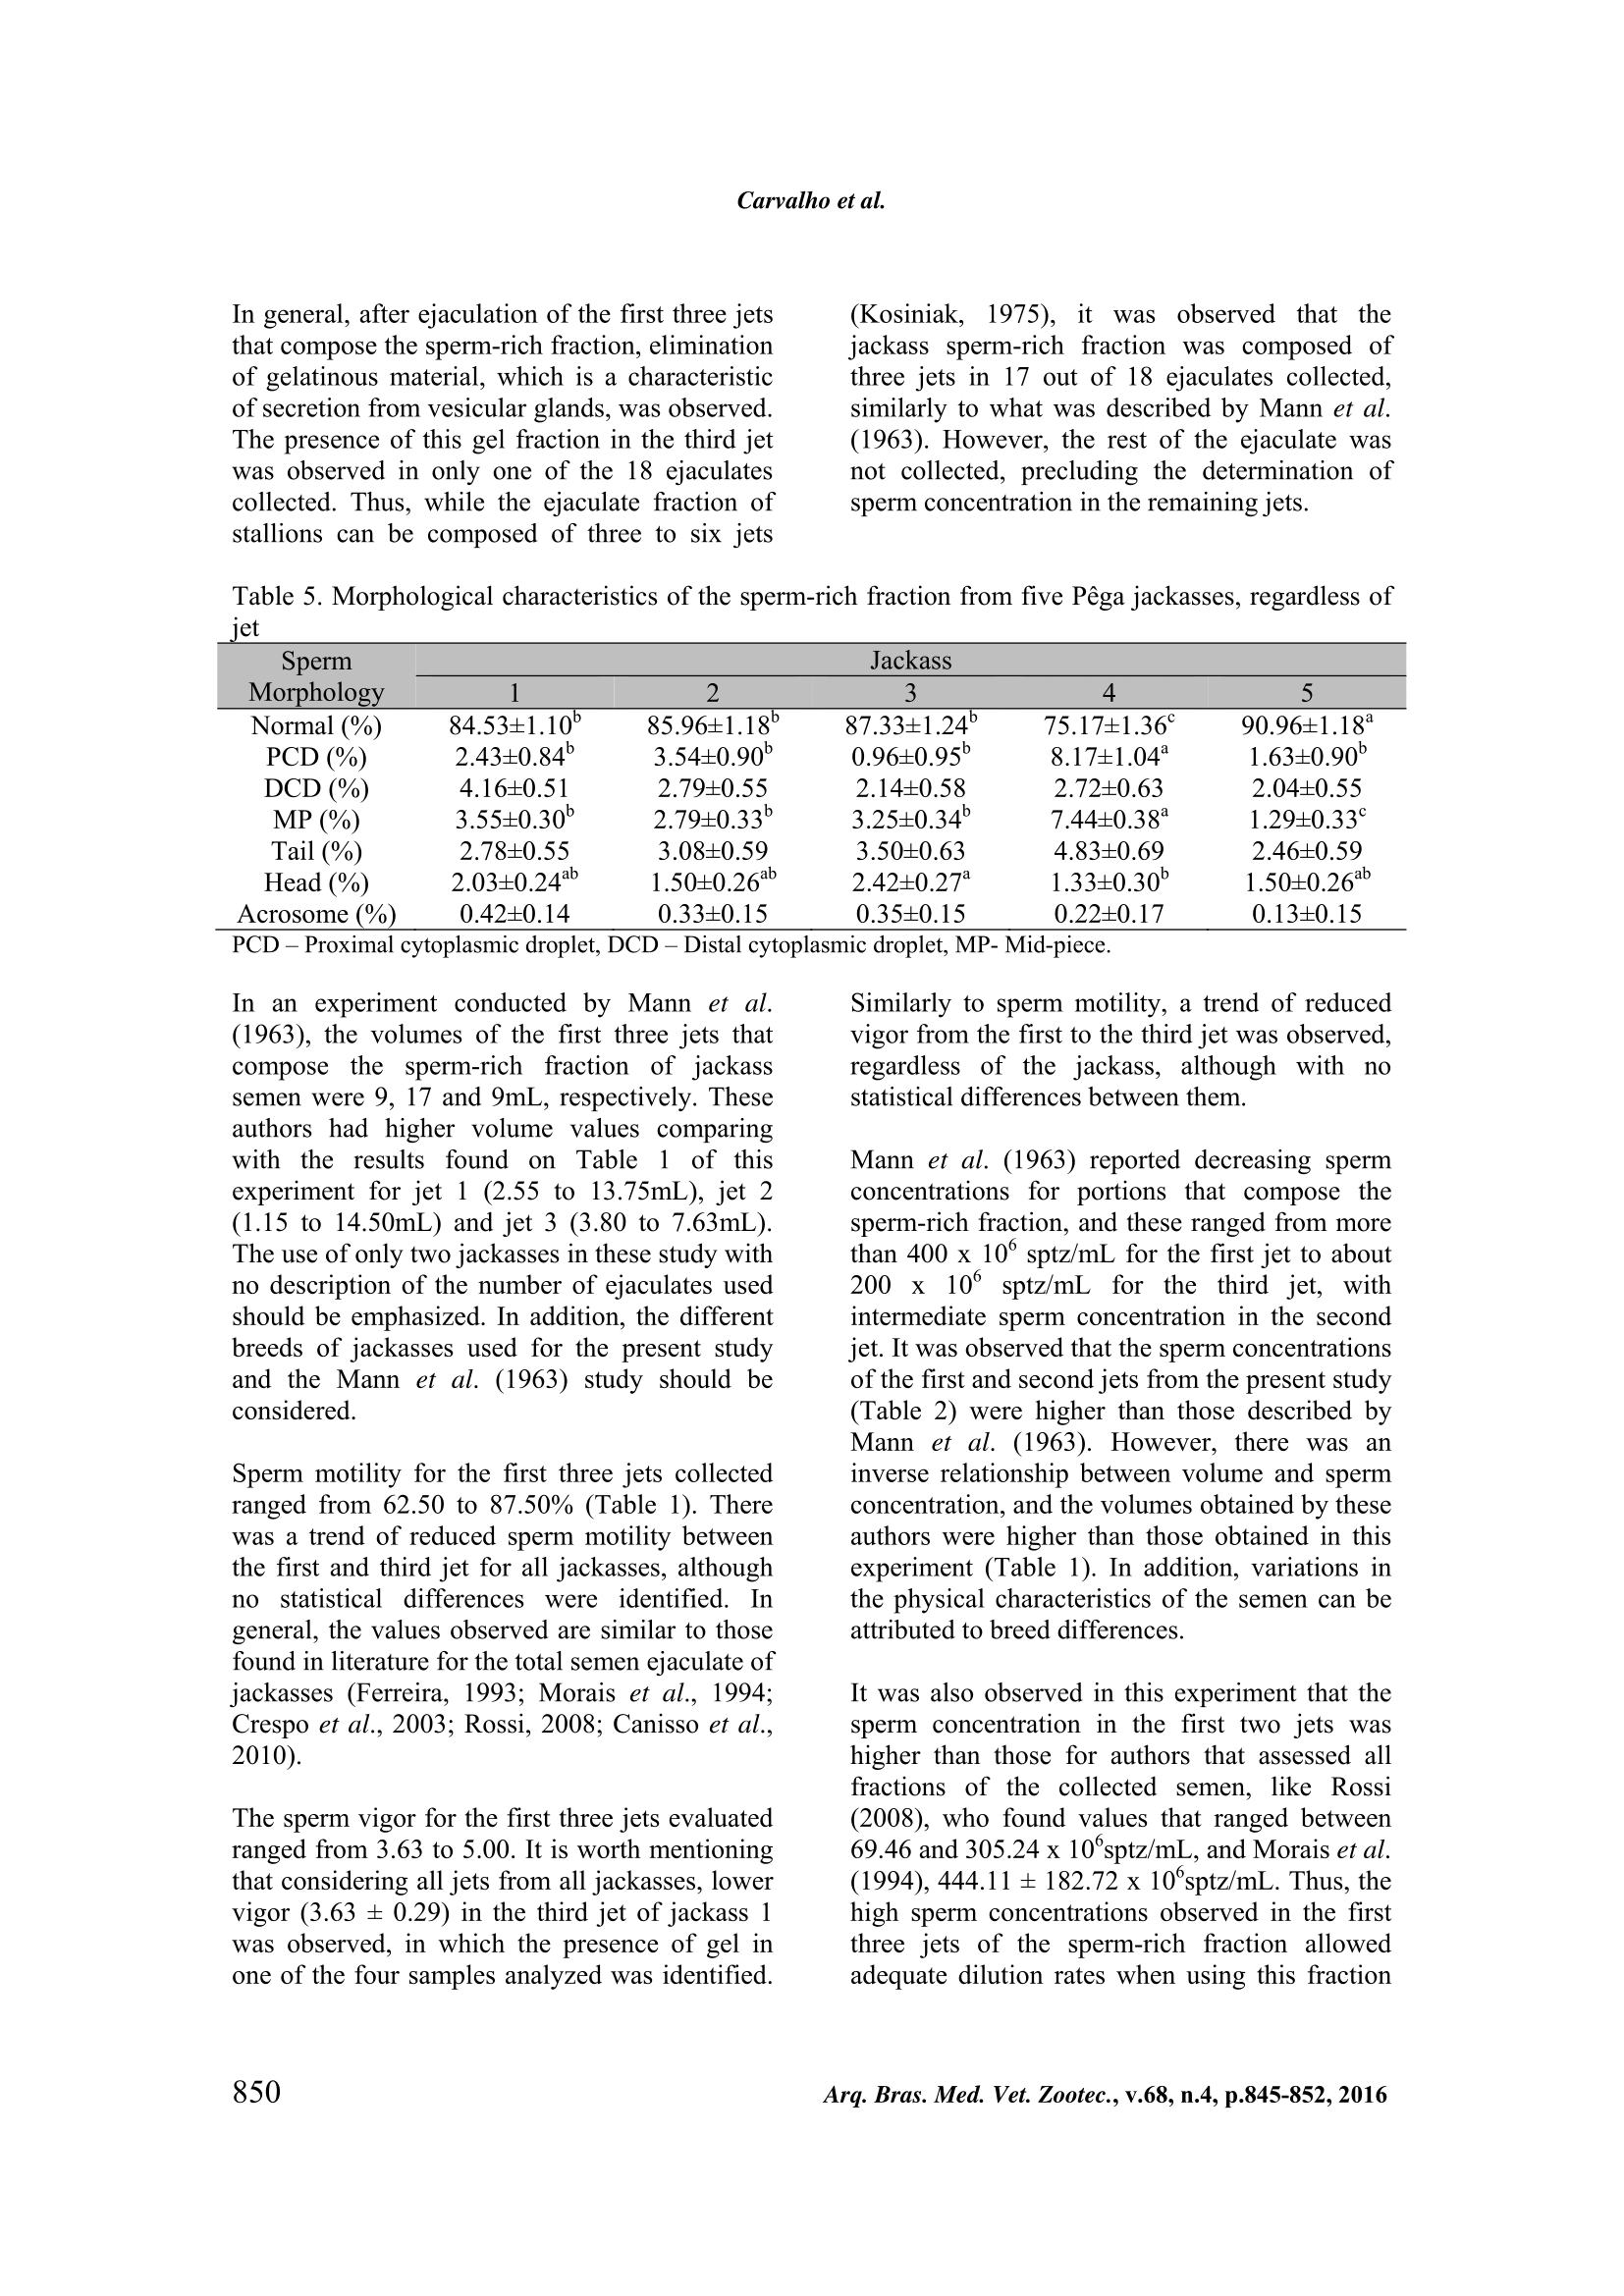 AMA 2-6 (1).png